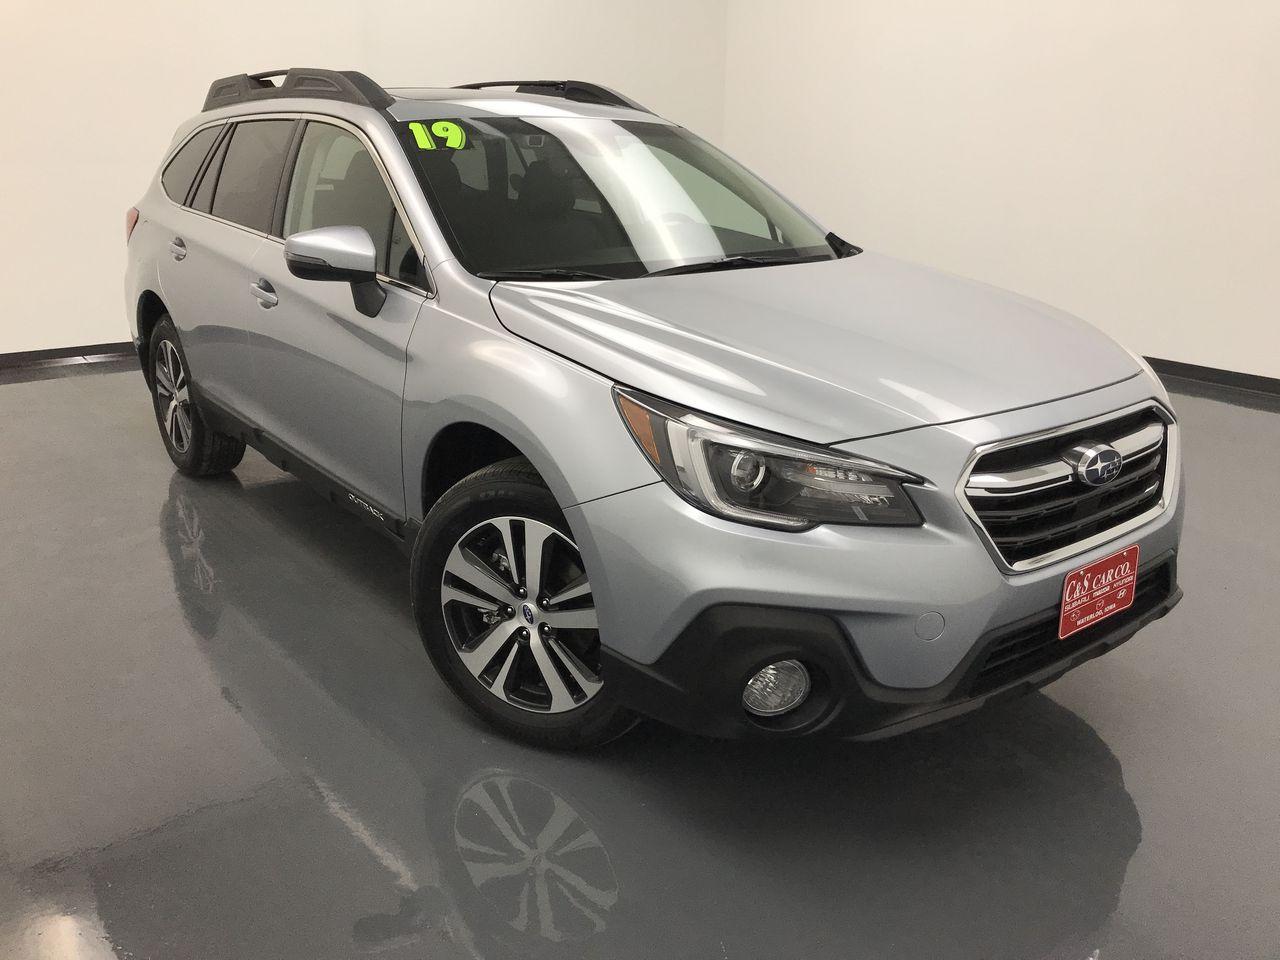 2019 Subaru Outback 25i Limited W Eyesight Stock Sb7037 1998 Dash Lights Thumbnail C S Car Company